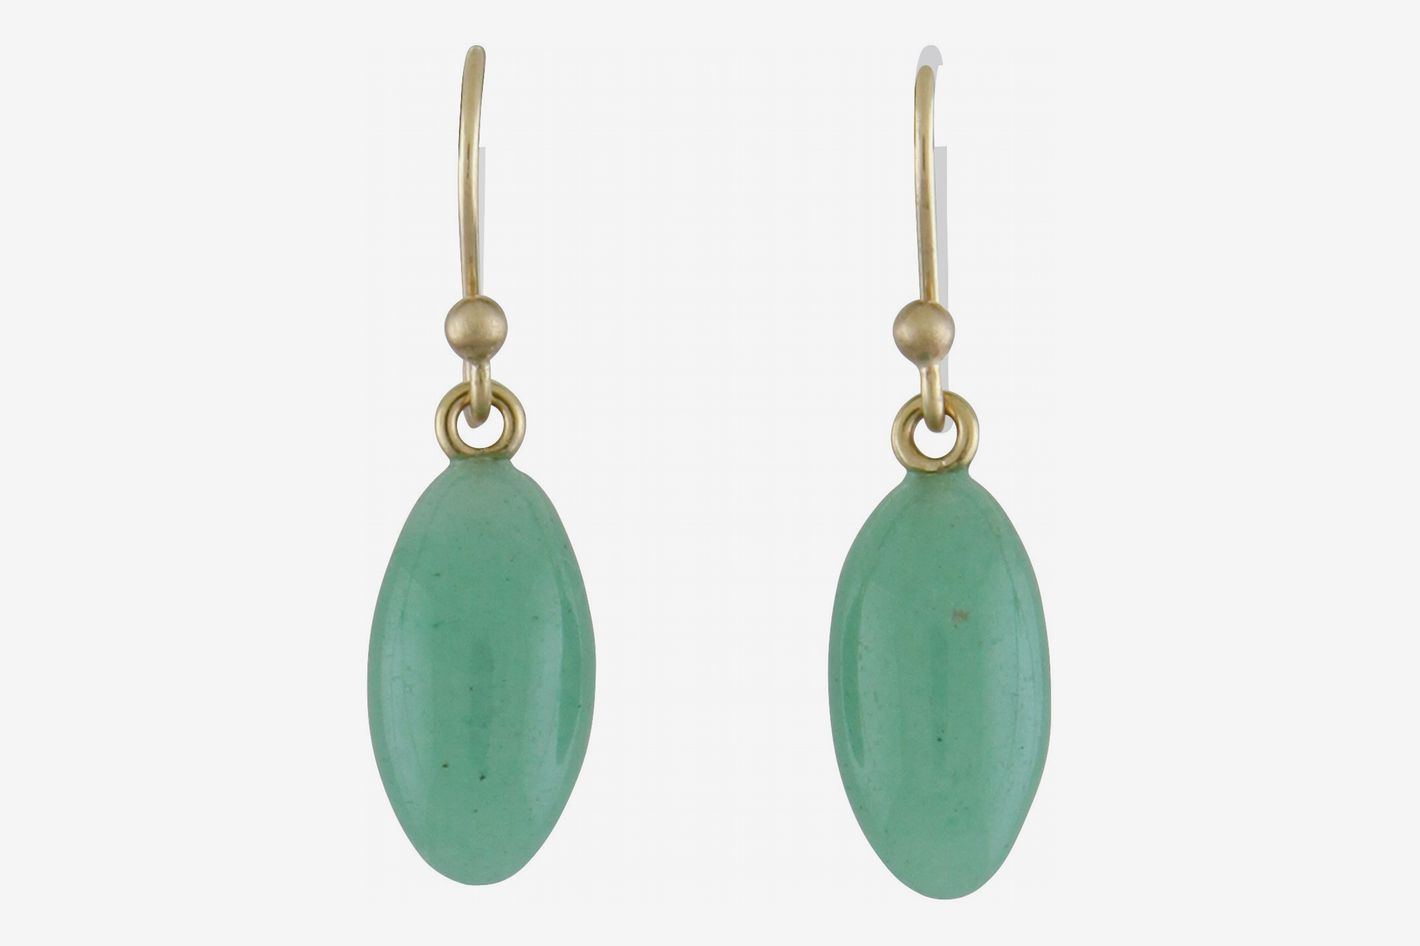 Ted Muehling Green Aventurine Berry Earrings